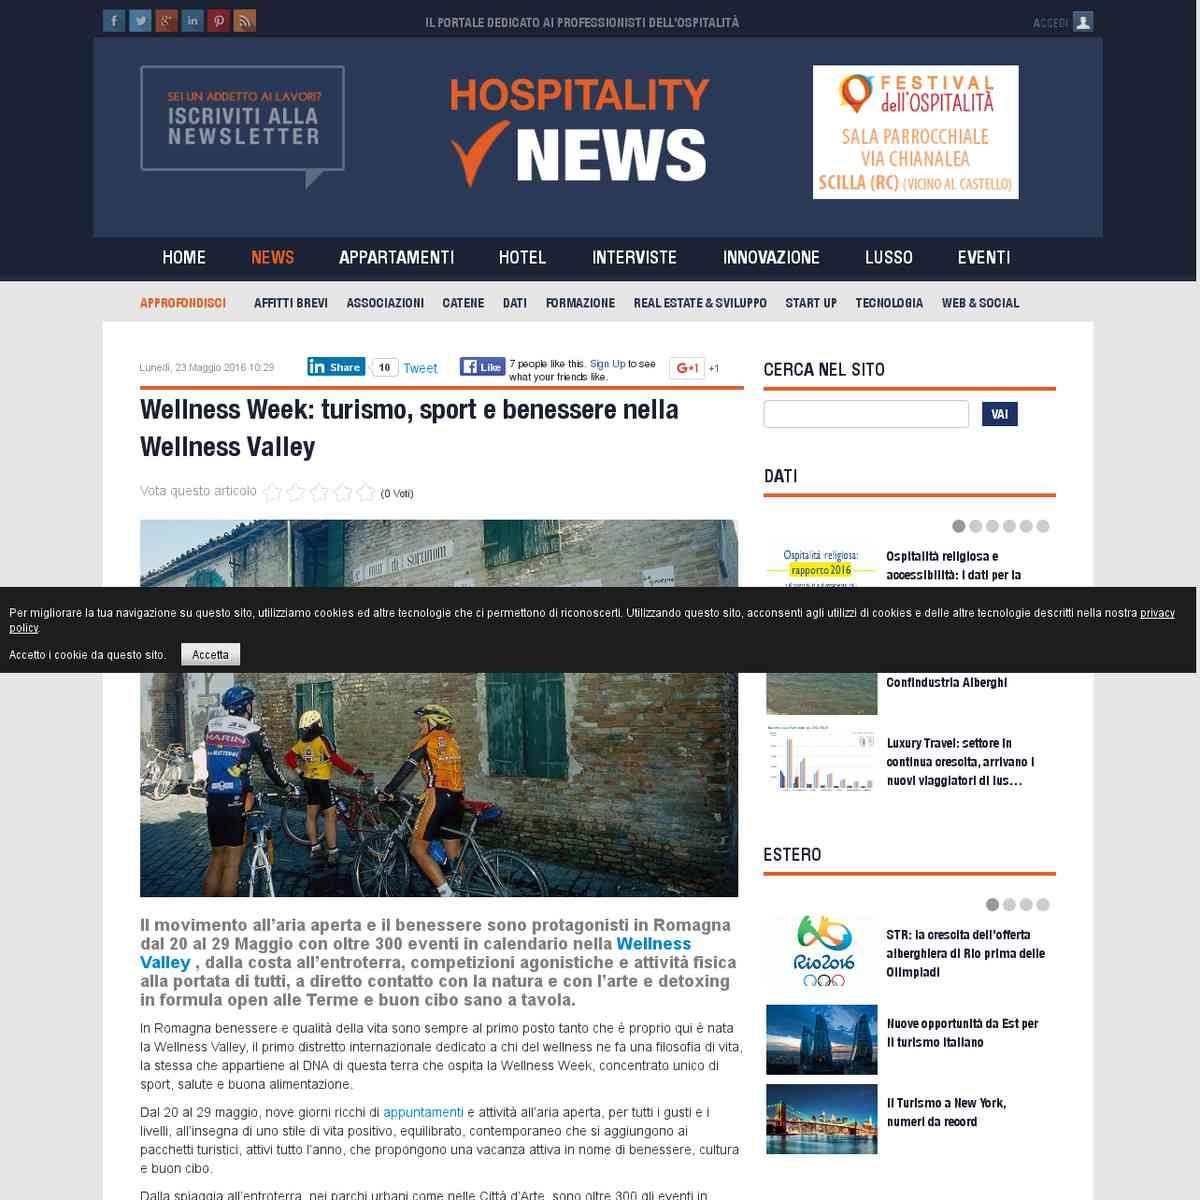 Wellness Week: turismo, sport e benessere nella Wellness Valley - Hospitality News.it - 23/05/2016